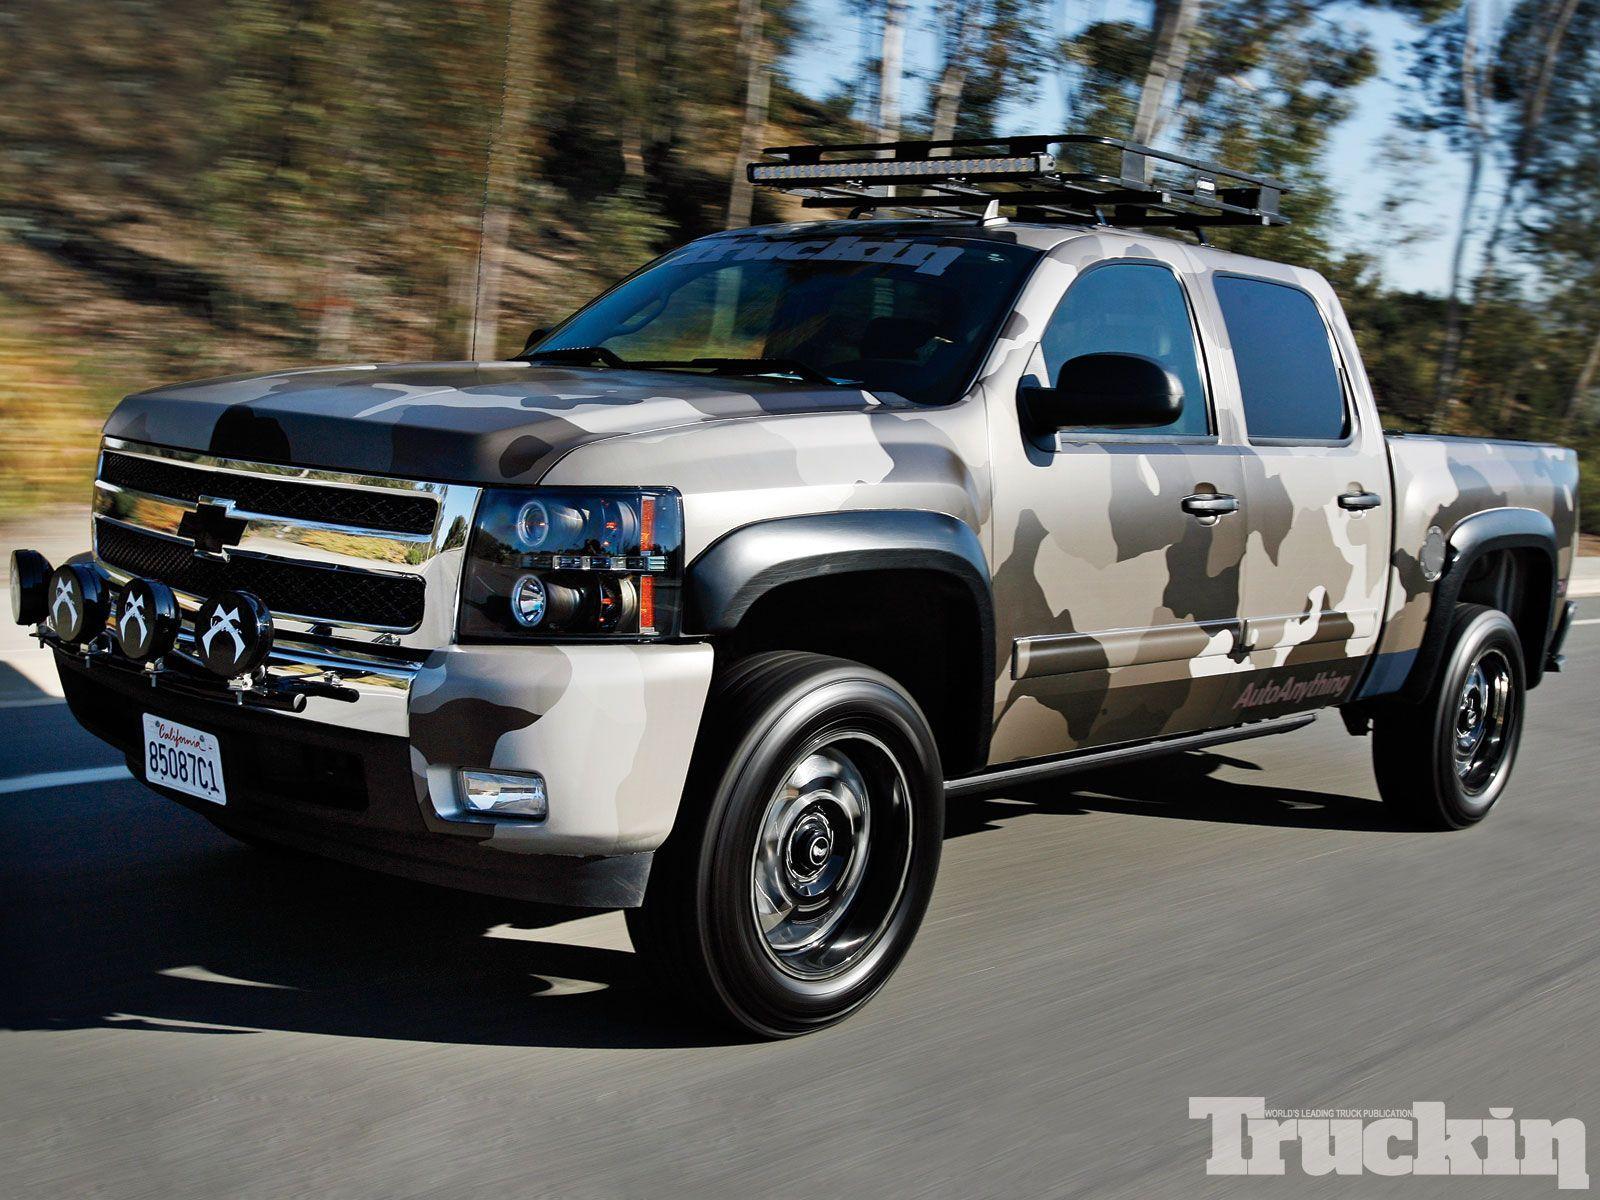 Project 12 Gauge 2011 Chevy Silverado Trucks 4x4